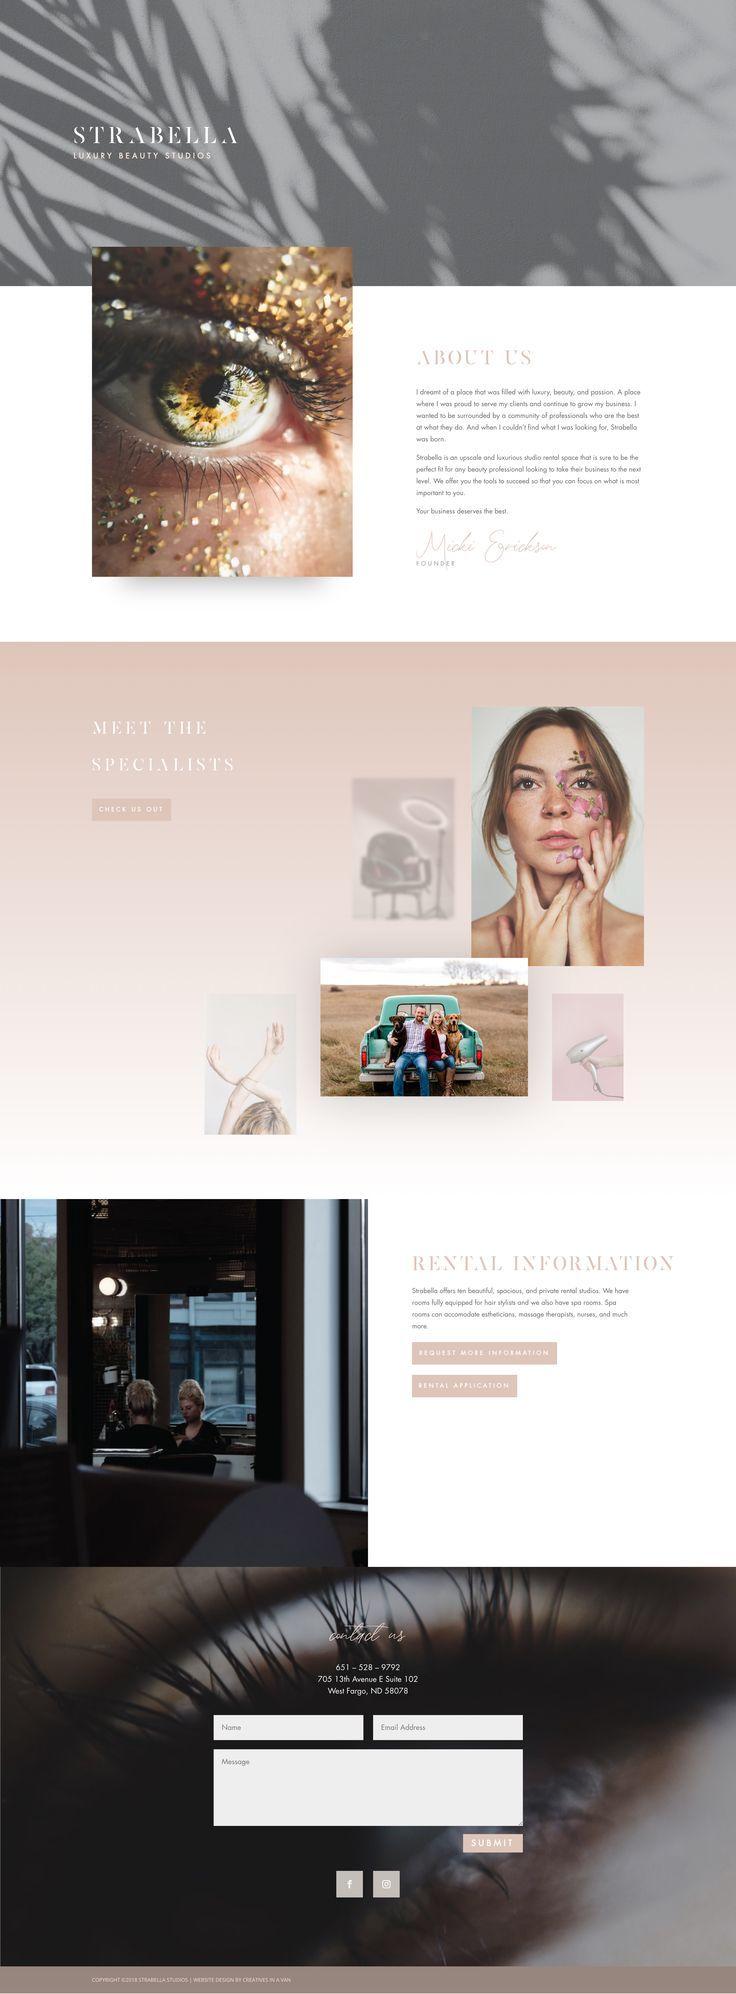 With Grace And Gold Branding Web Design And Education For Creative Women In Business Bra Web Development Design Portfolio Web Design Website Design Layout